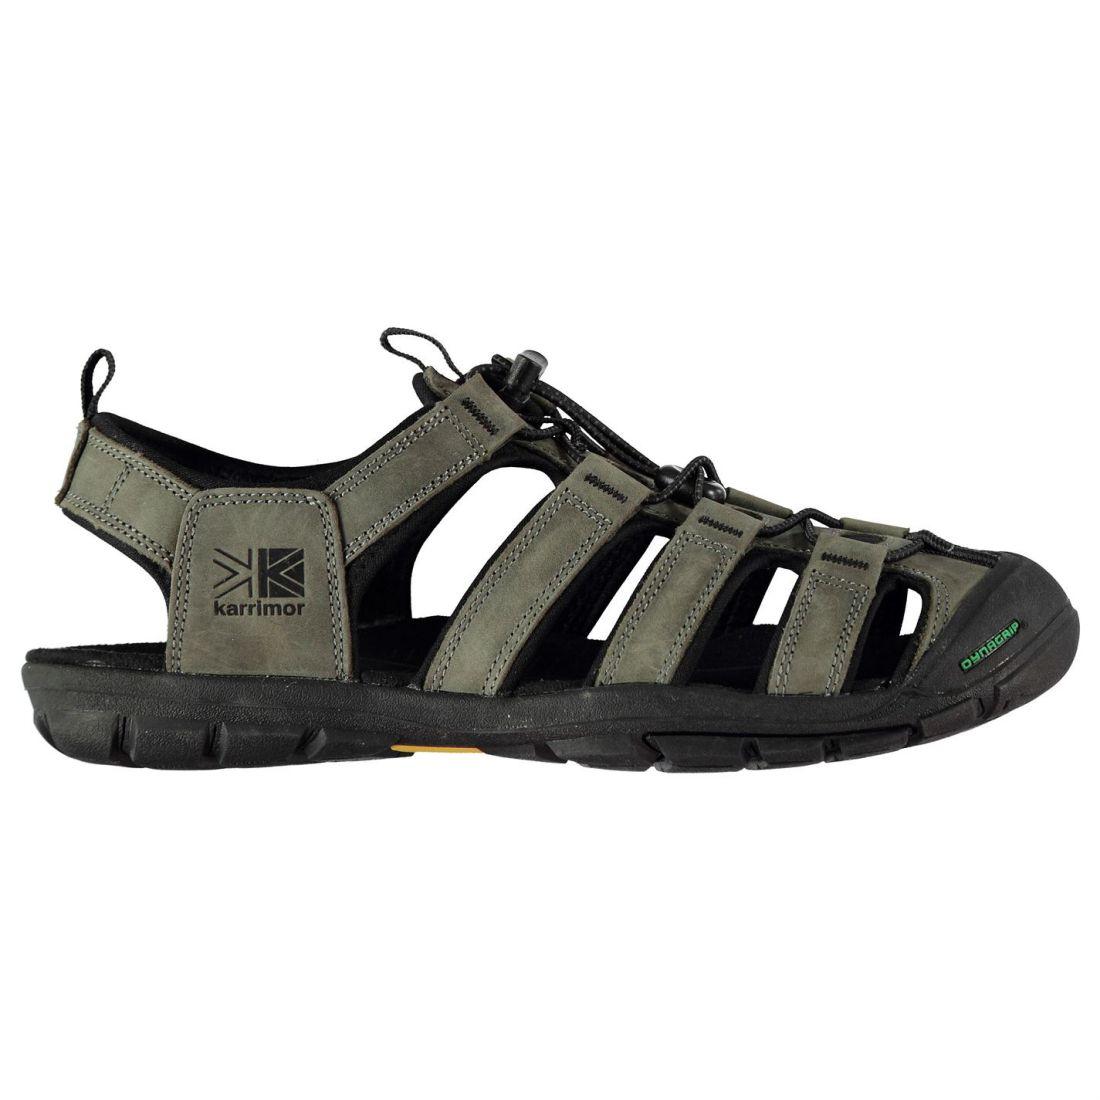 1f6a7dd8e94771 Karrimor Mens Ithaca Lth Sandals